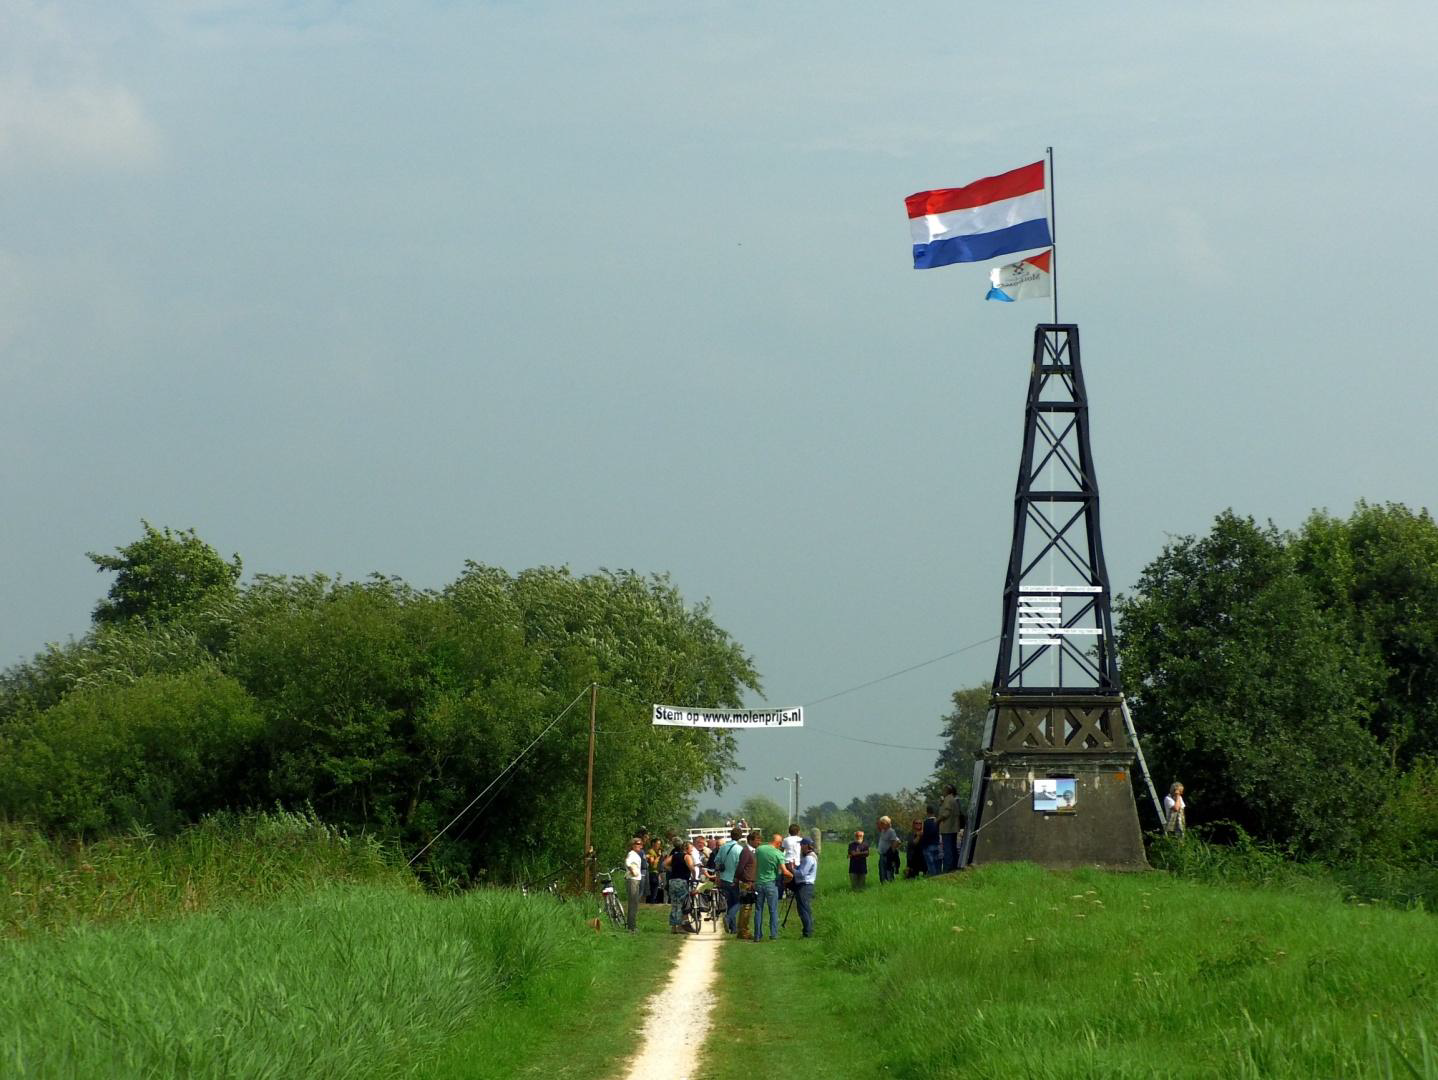 Stem op de molen - Molenprijs 2013